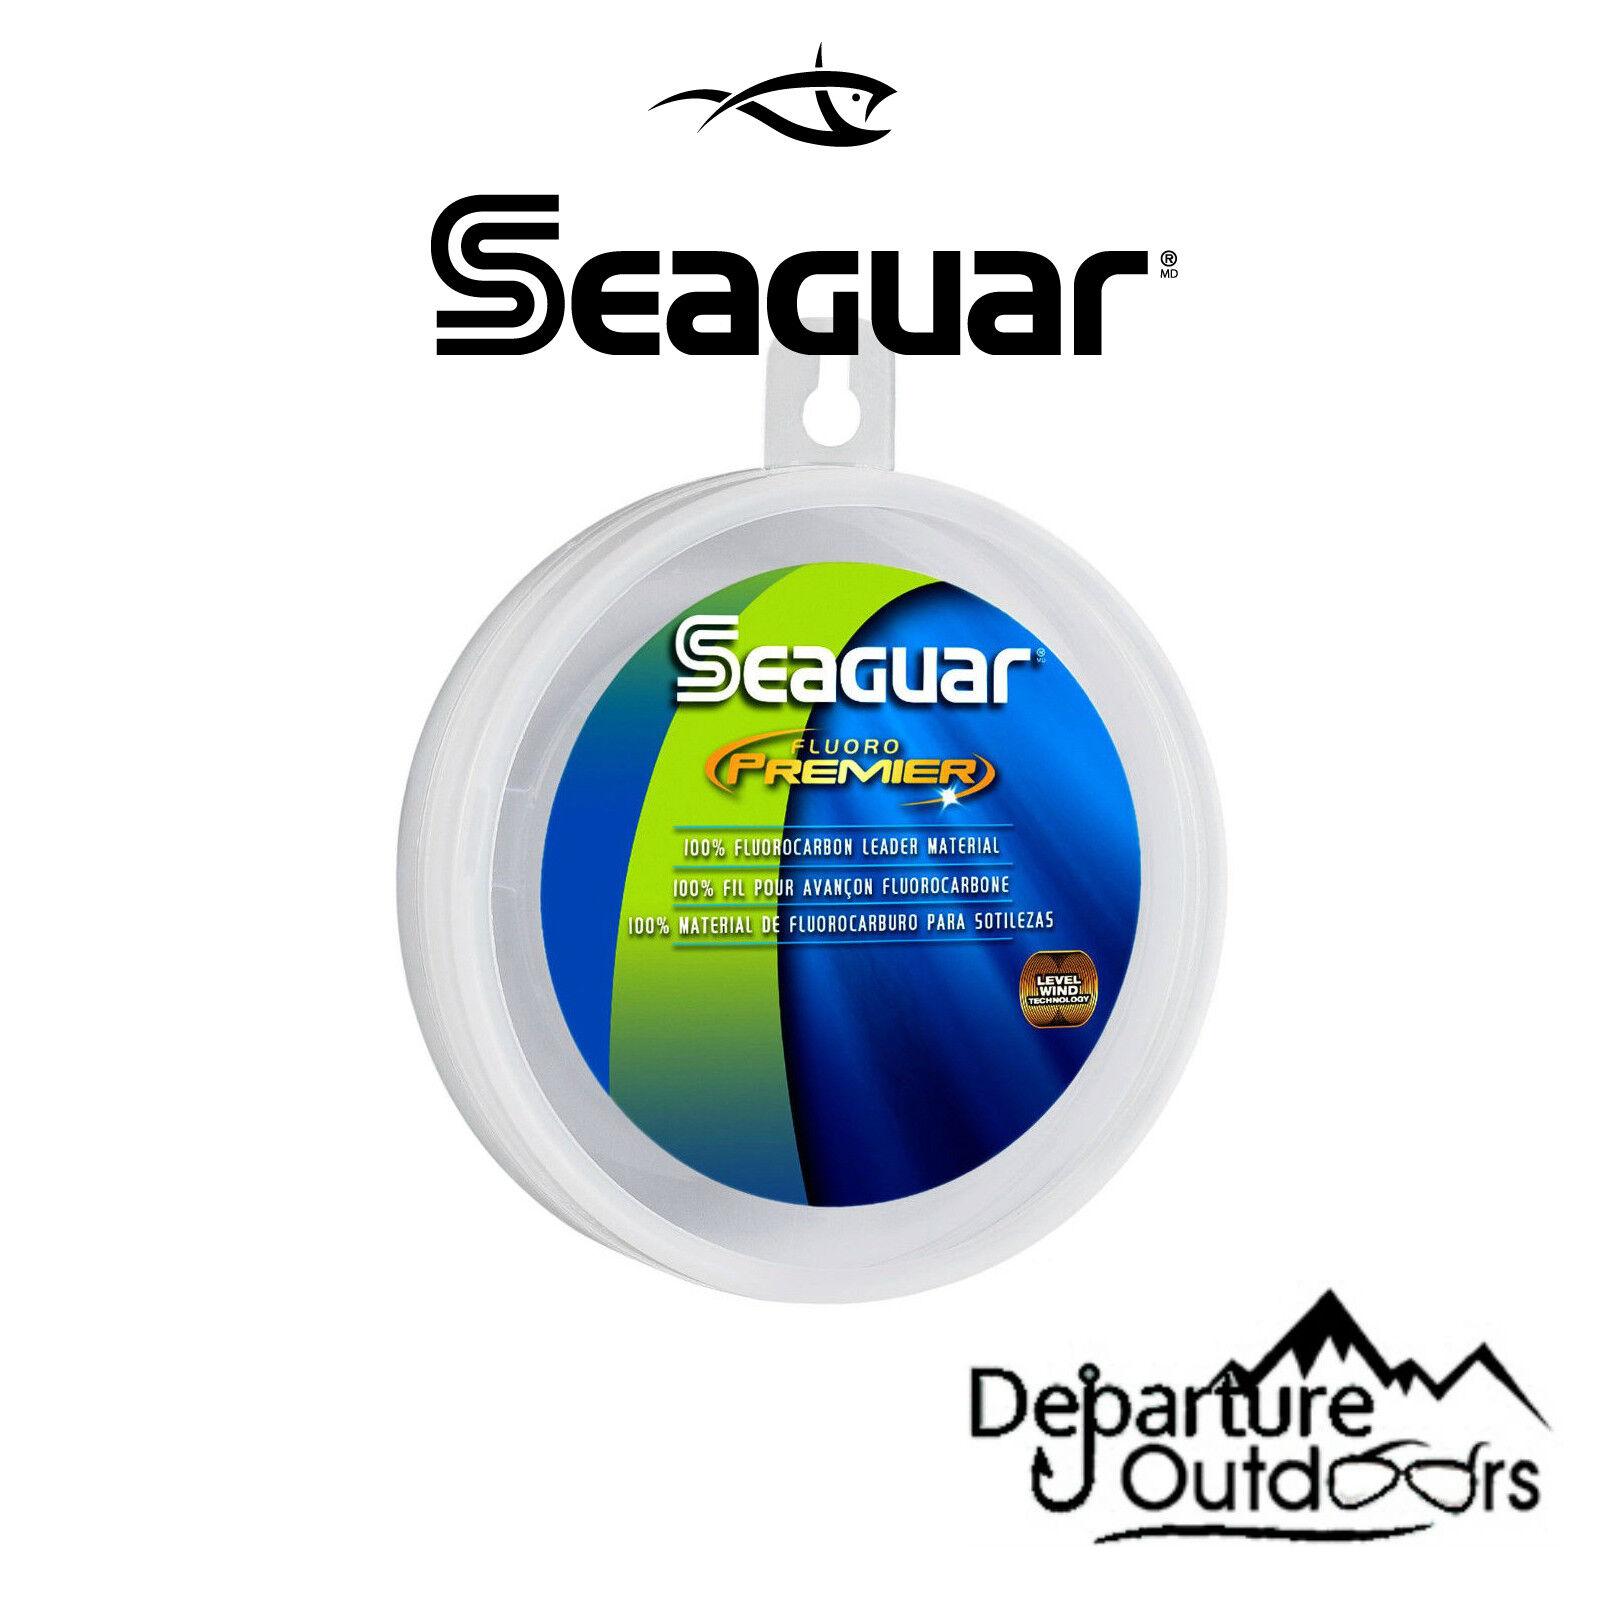 Seaguar Fluoro Premier Fluorocarbon Leader Clear Fishing Lin